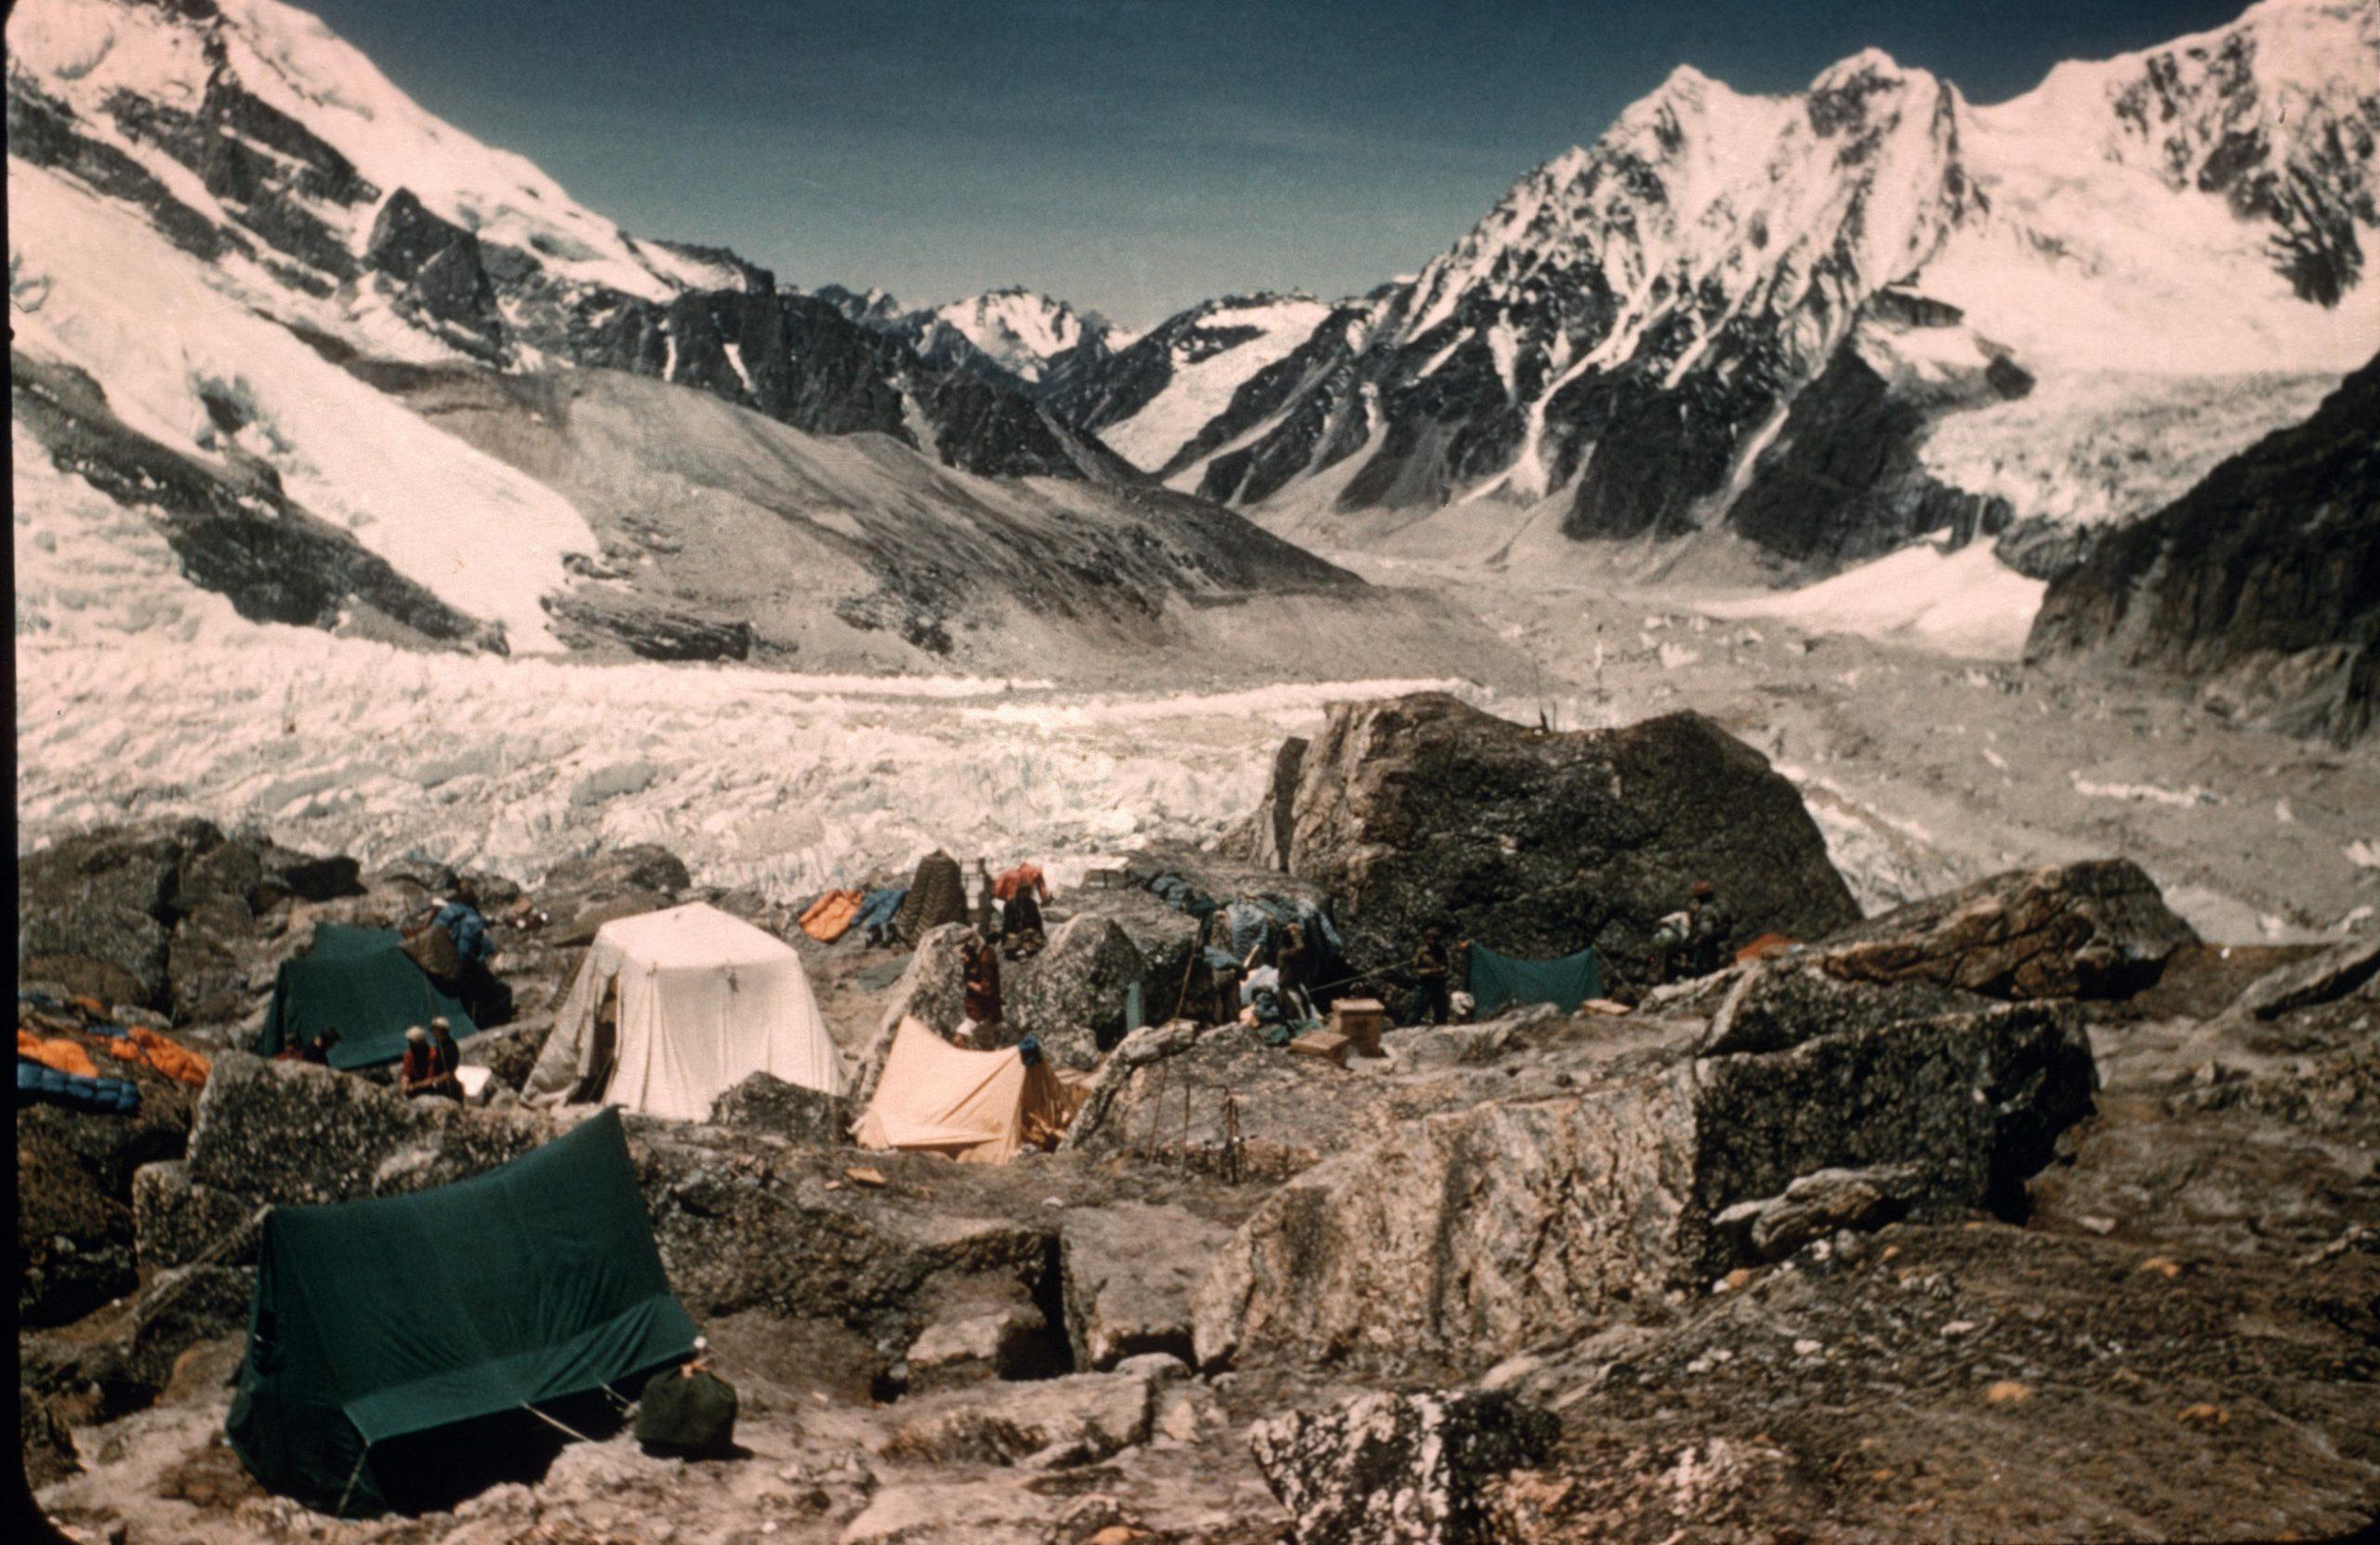 Base camp, Kanchenjunga, 1955.